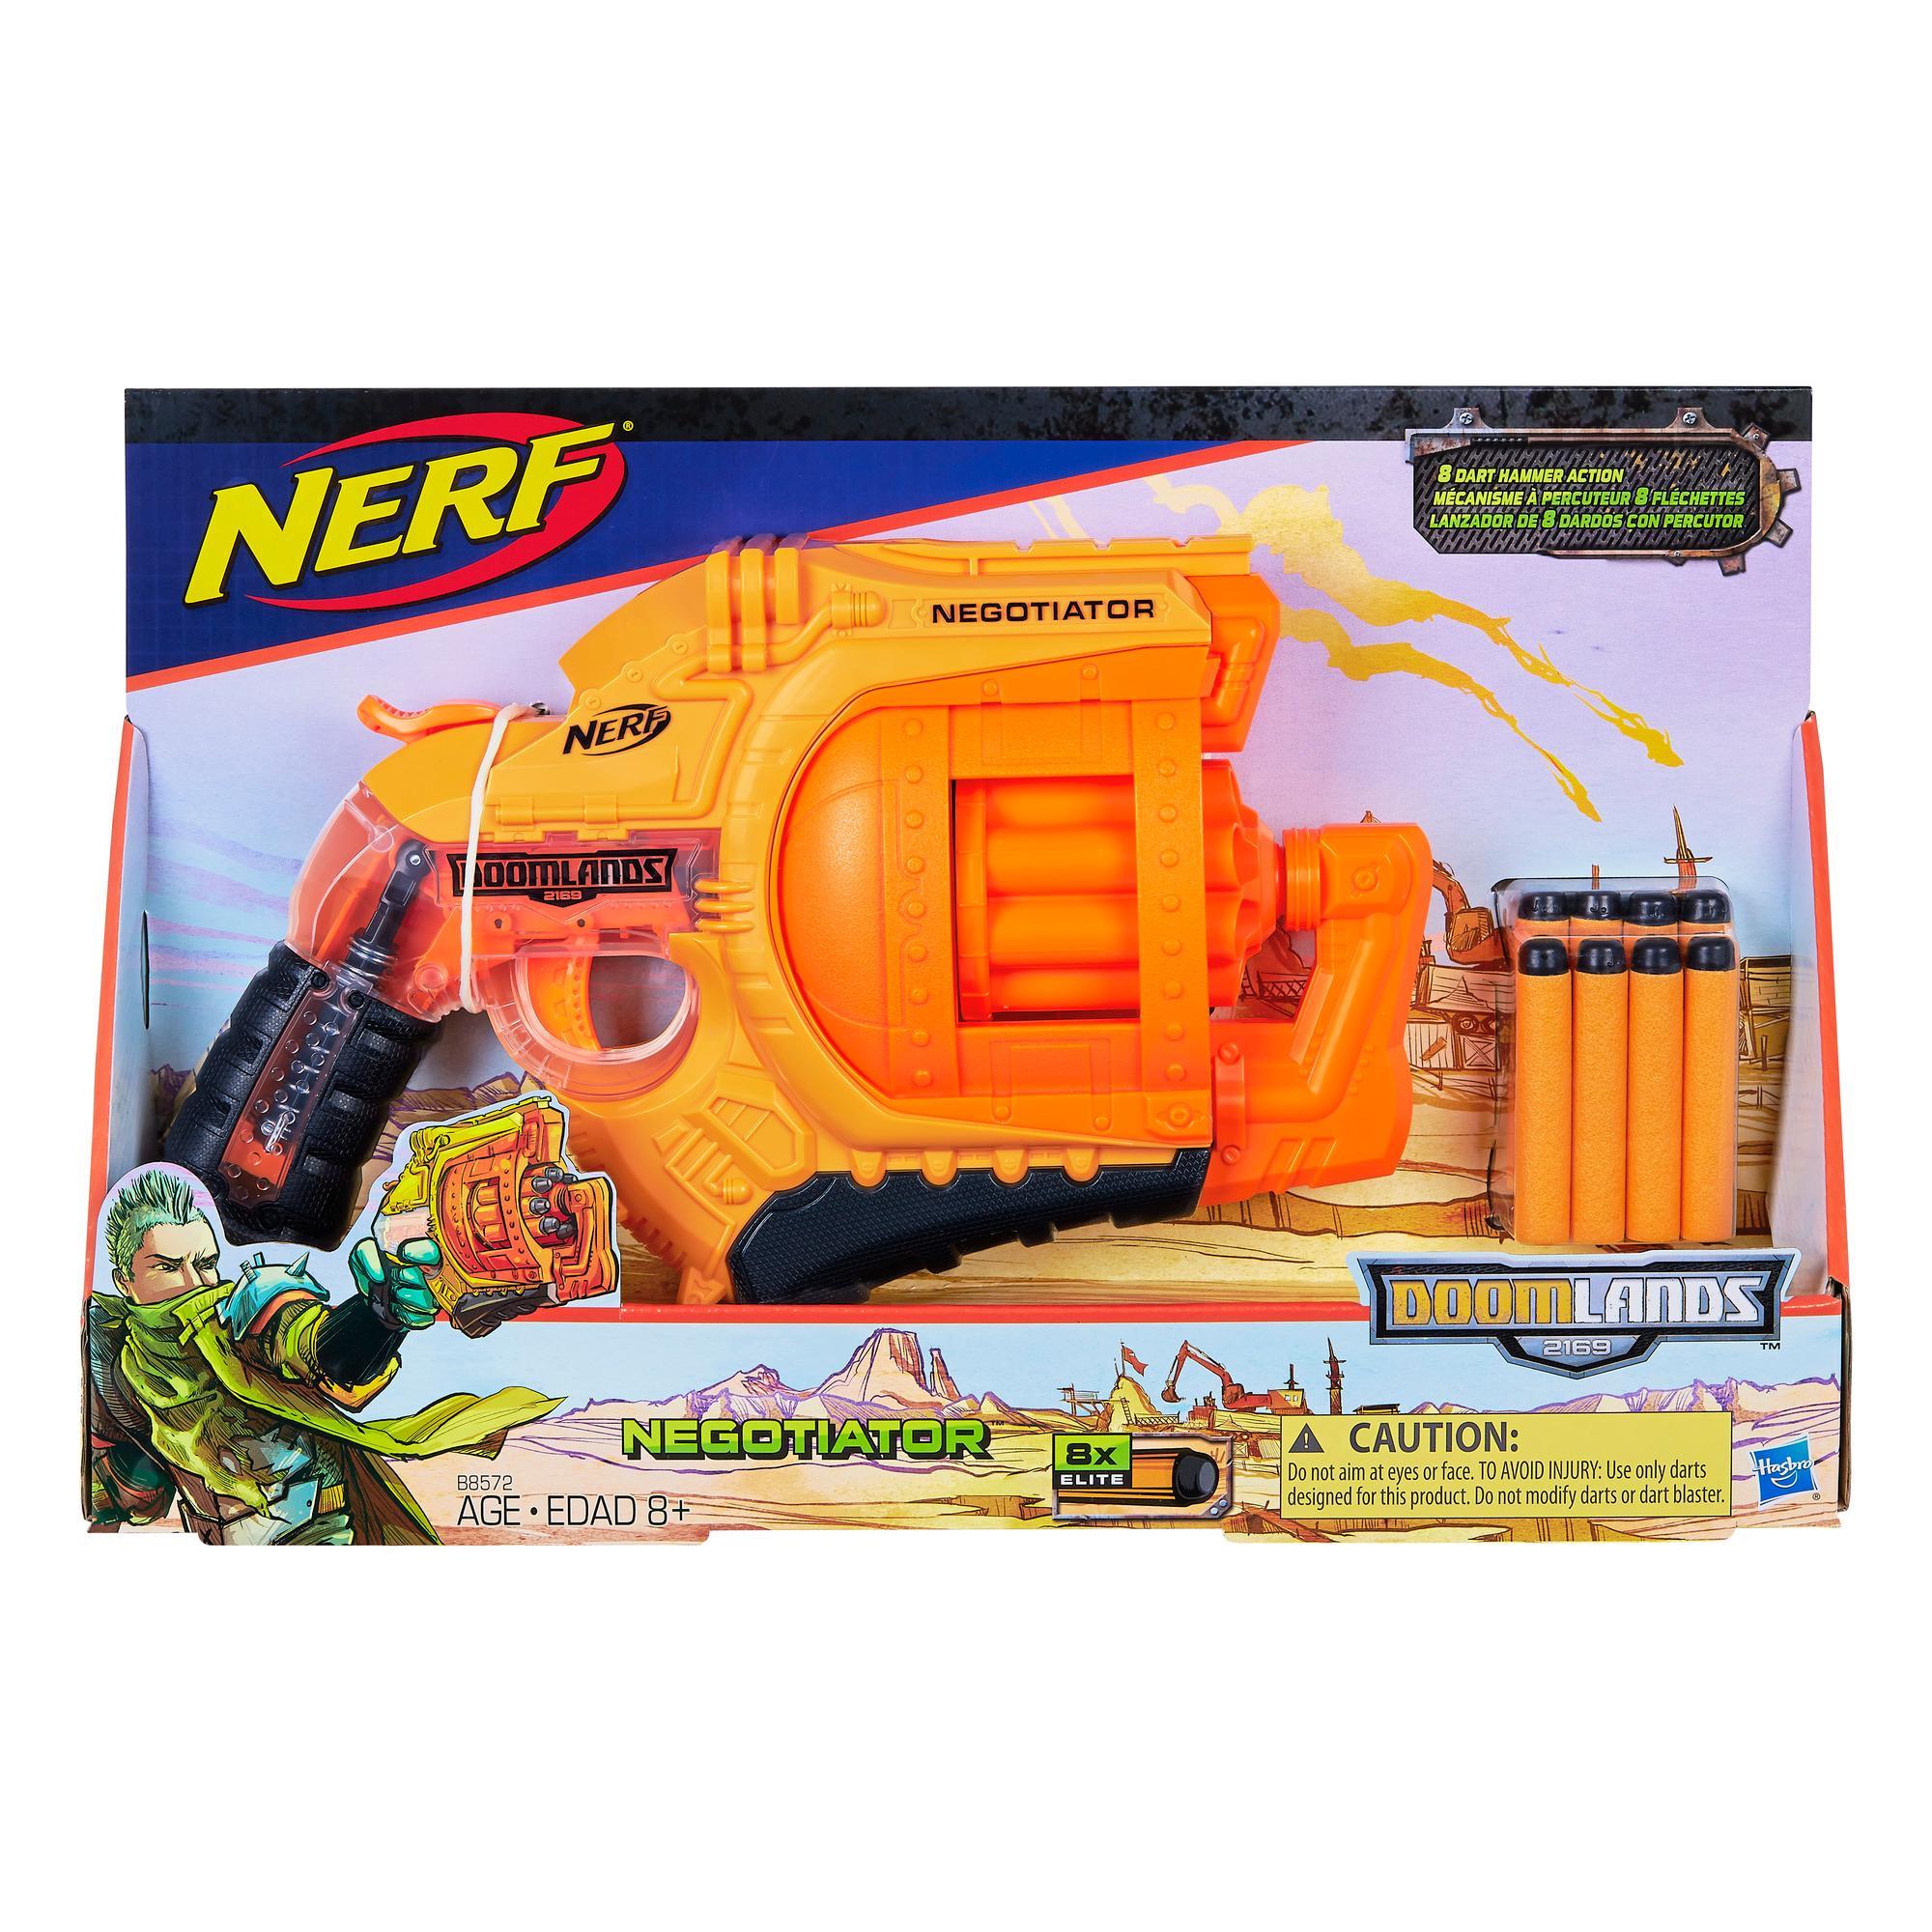 Walmart Toy Guns For Boys : Amazon nerf doomlands negotiator blaster toys